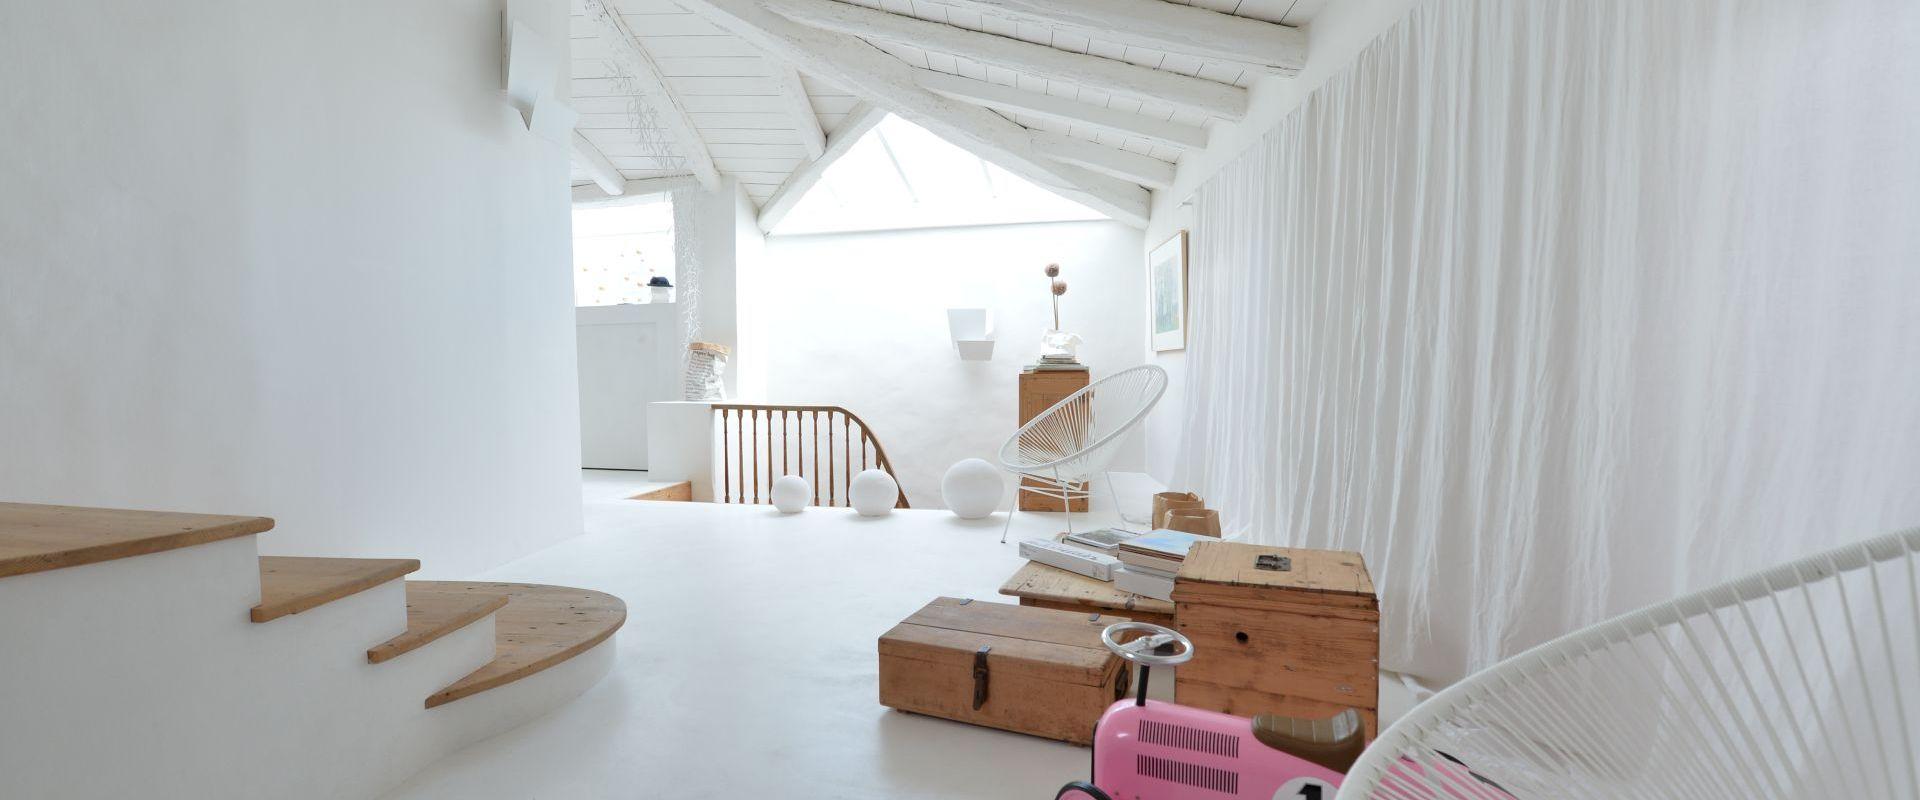 actualit s immobili res 2018 tendances ateliers lofts. Black Bedroom Furniture Sets. Home Design Ideas